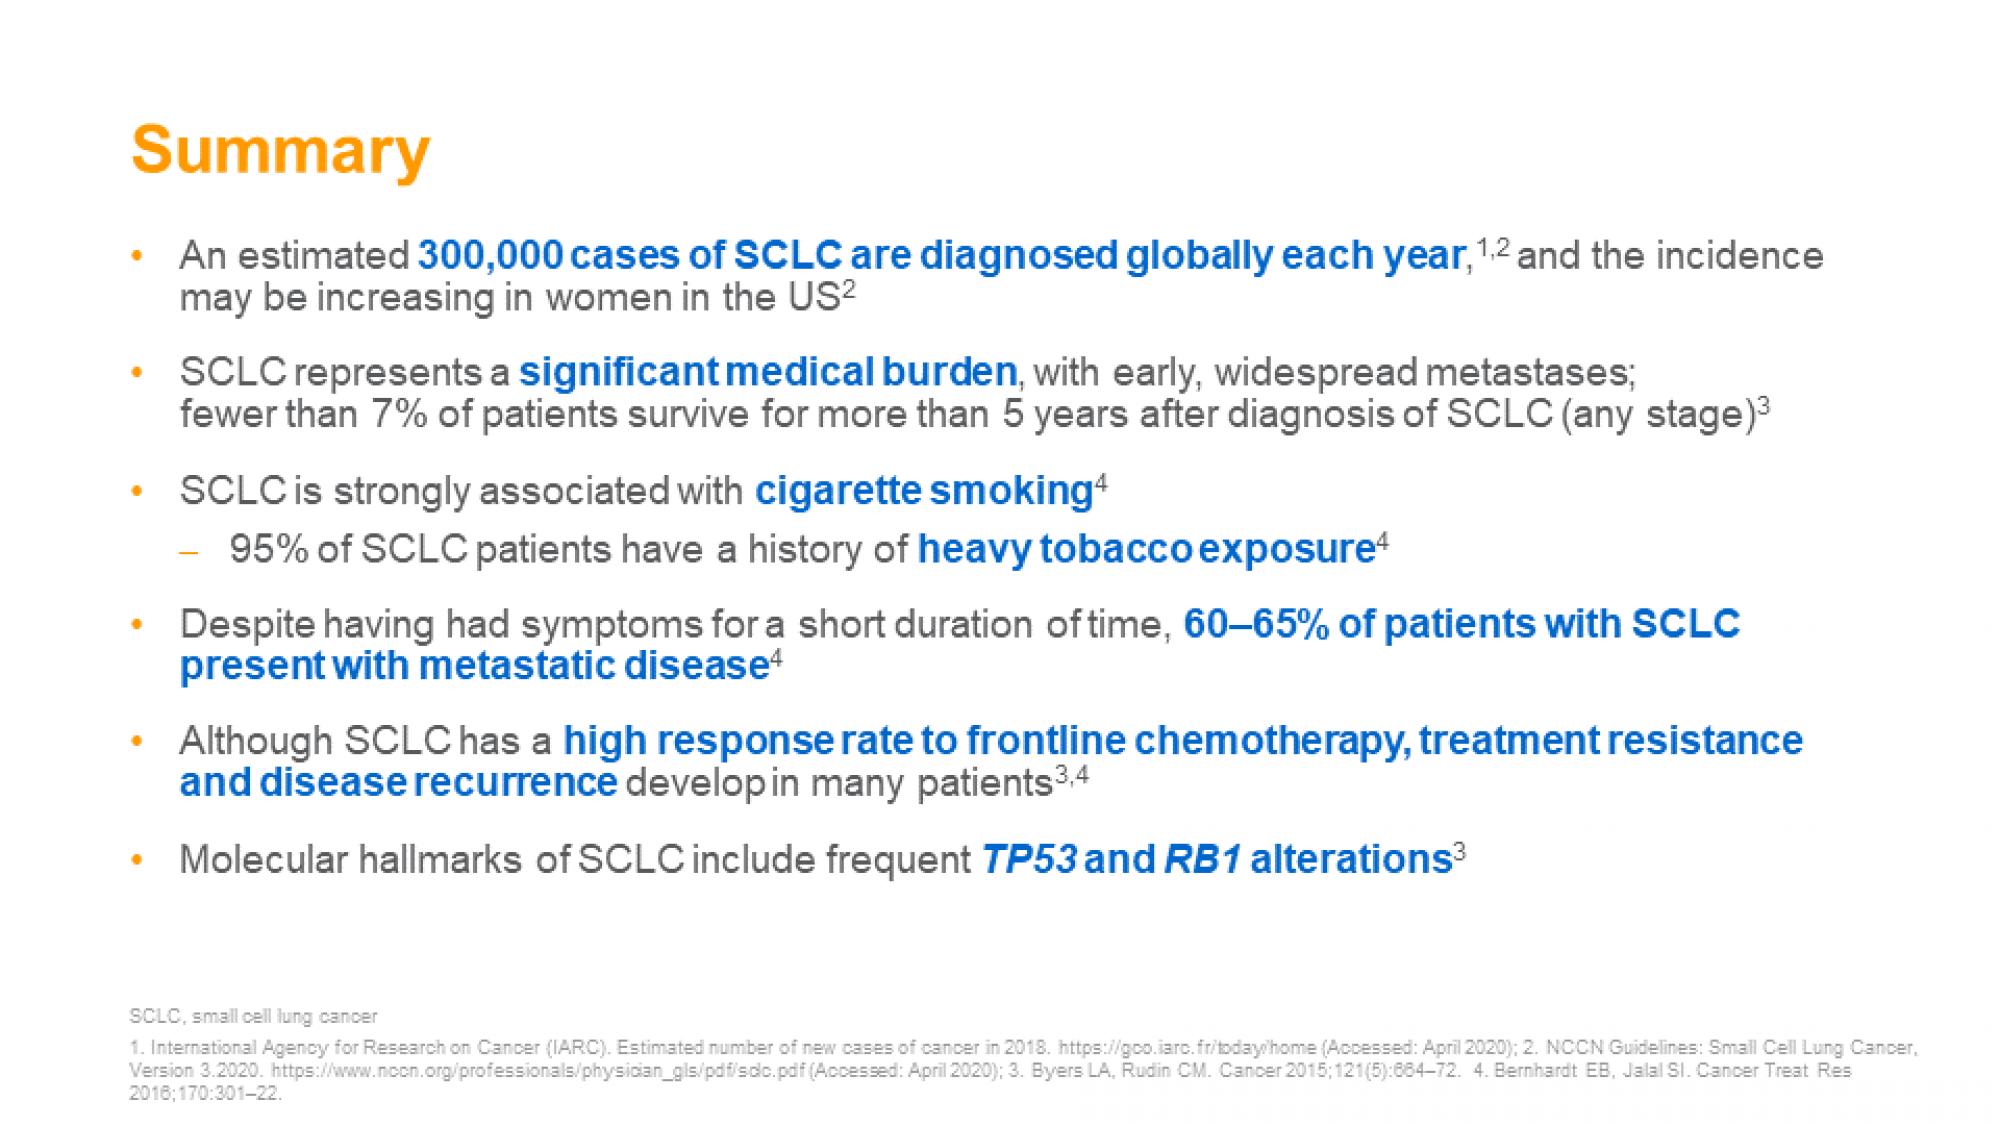 SCLC slide 18